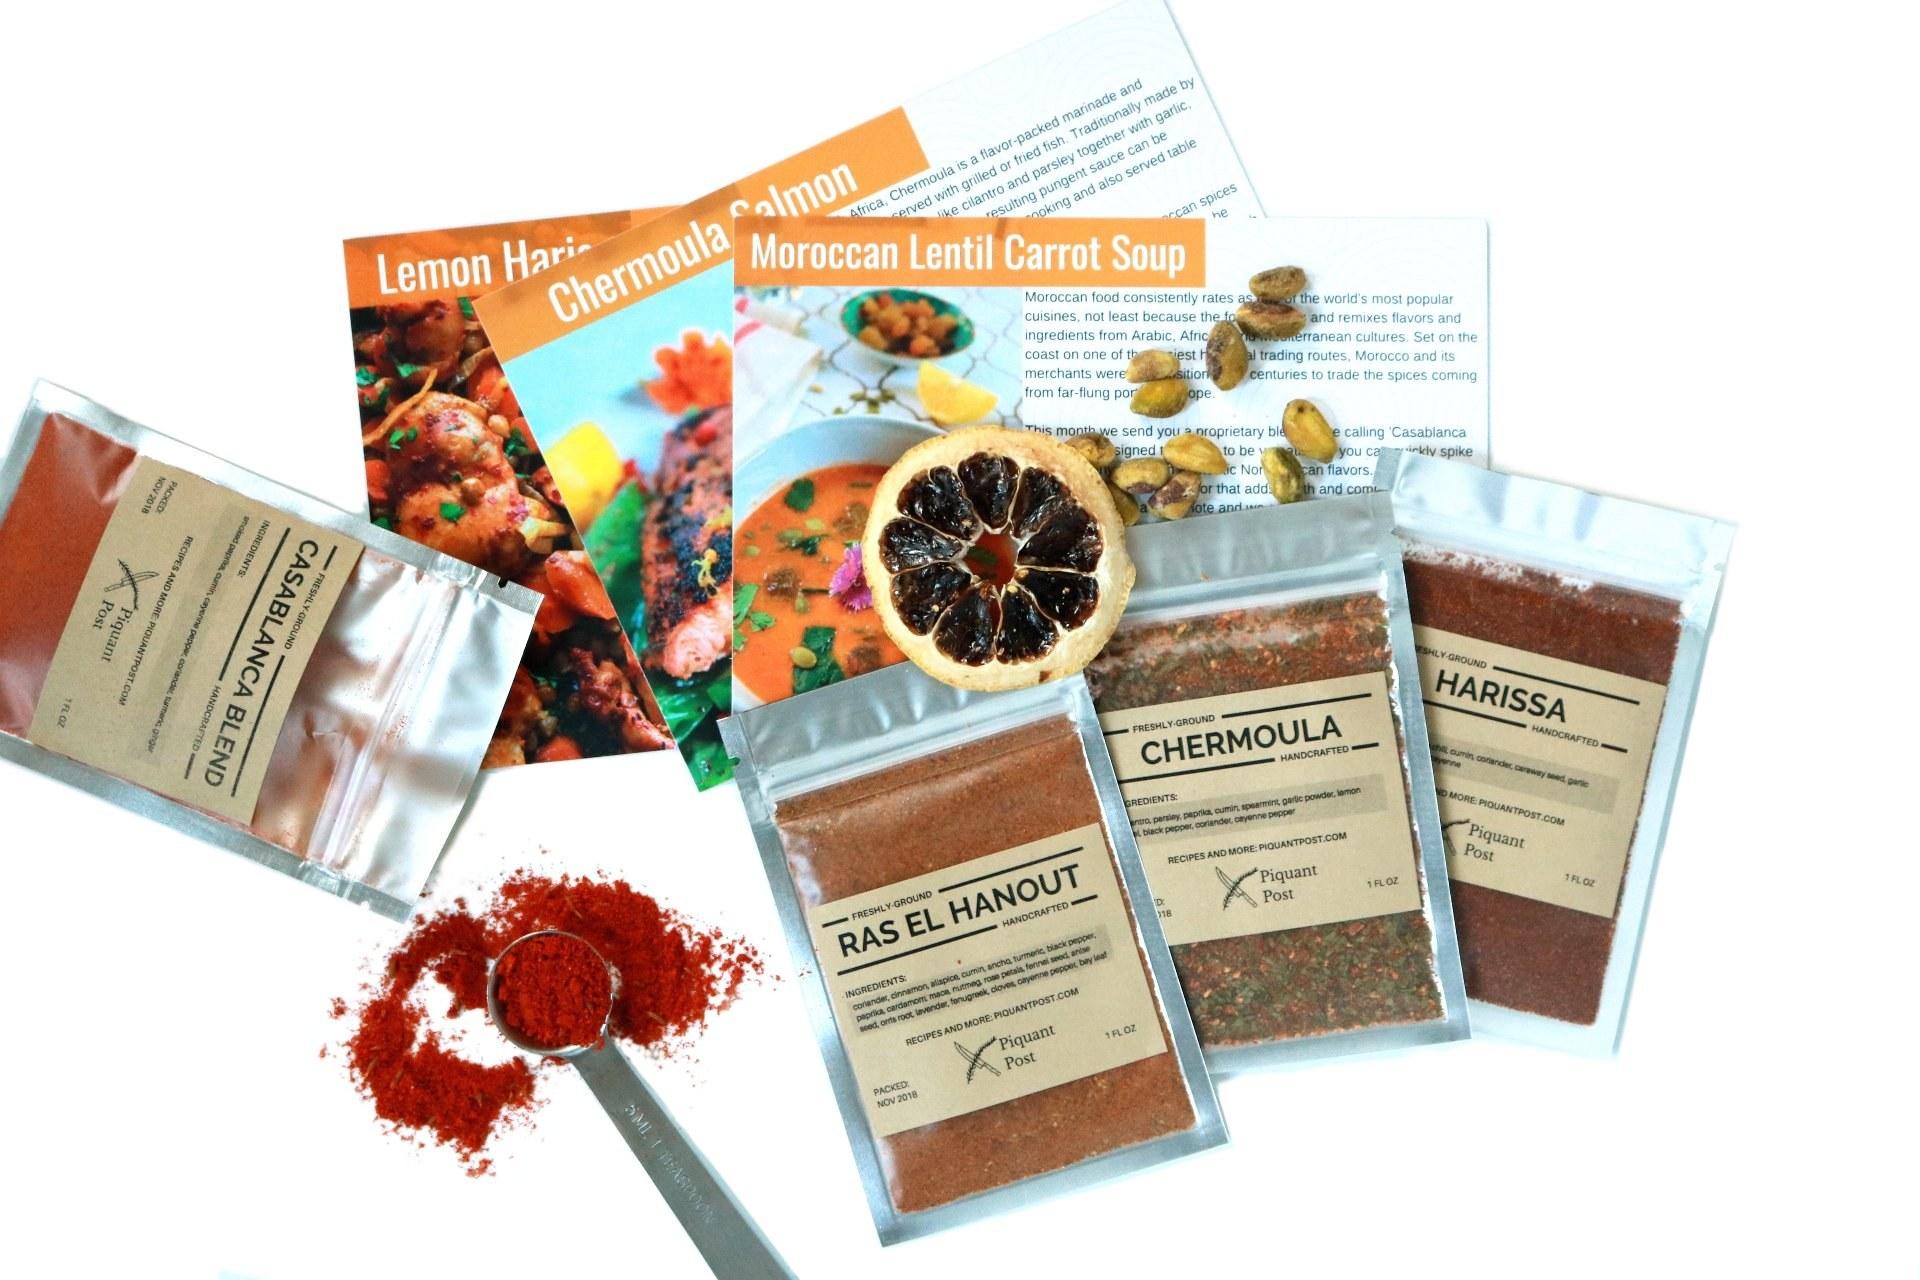 Casablanca blend, ras el hanout, chermoula, and harissa seasoning packets